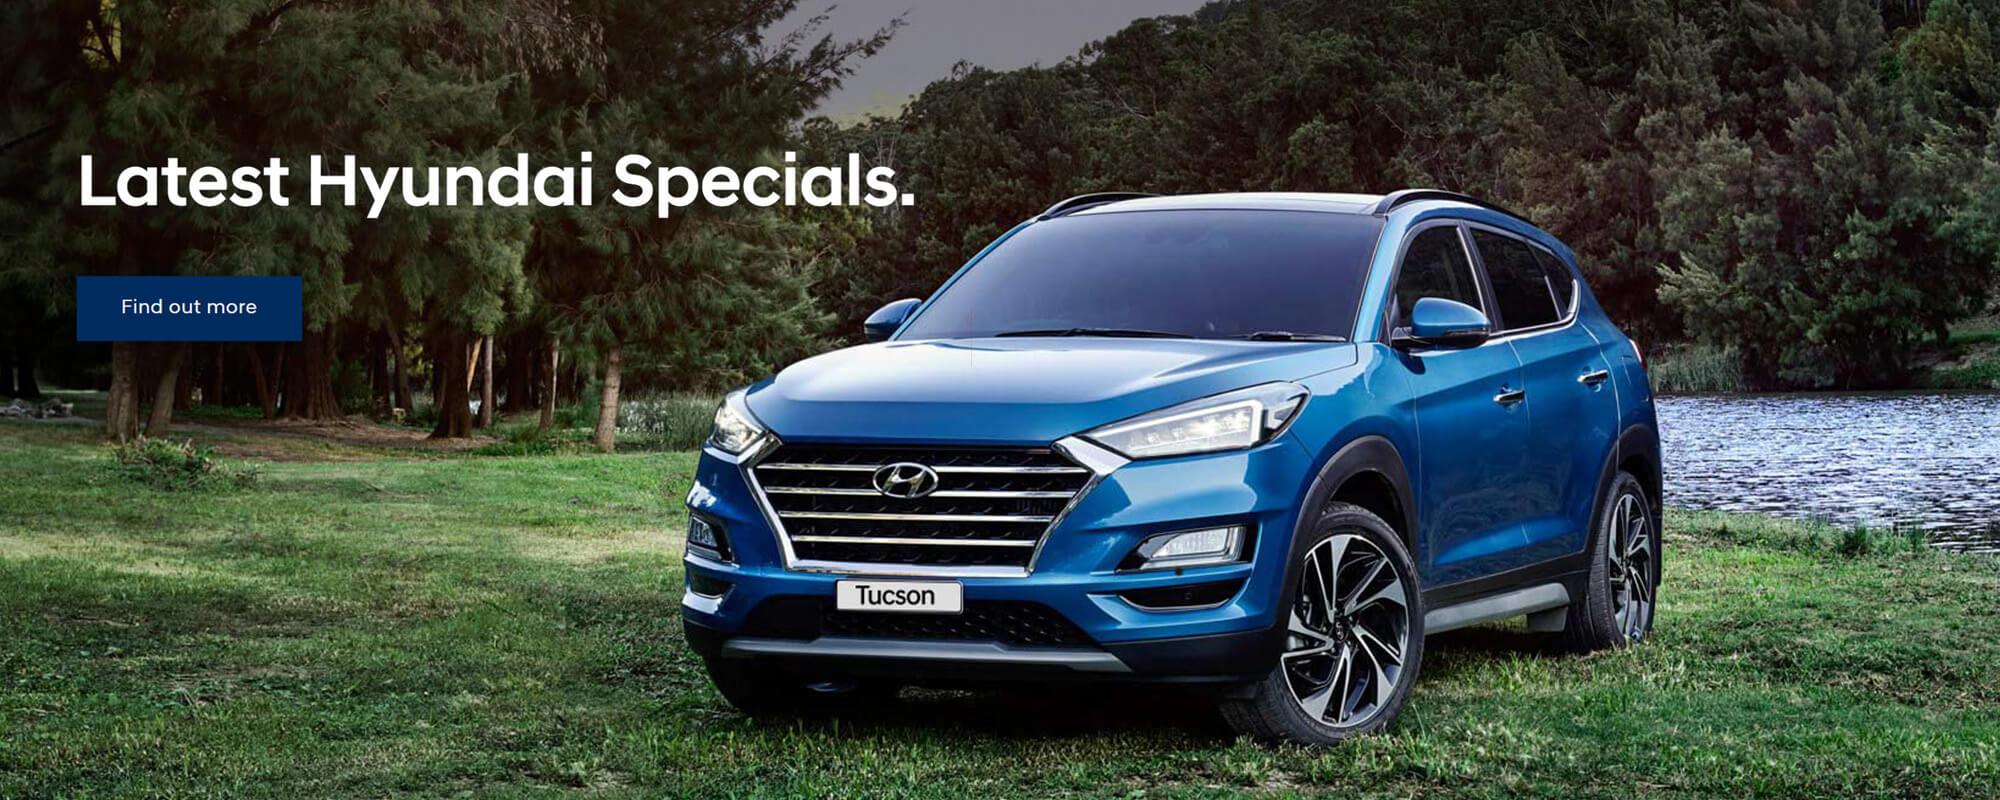 Latest Hyundai Specials